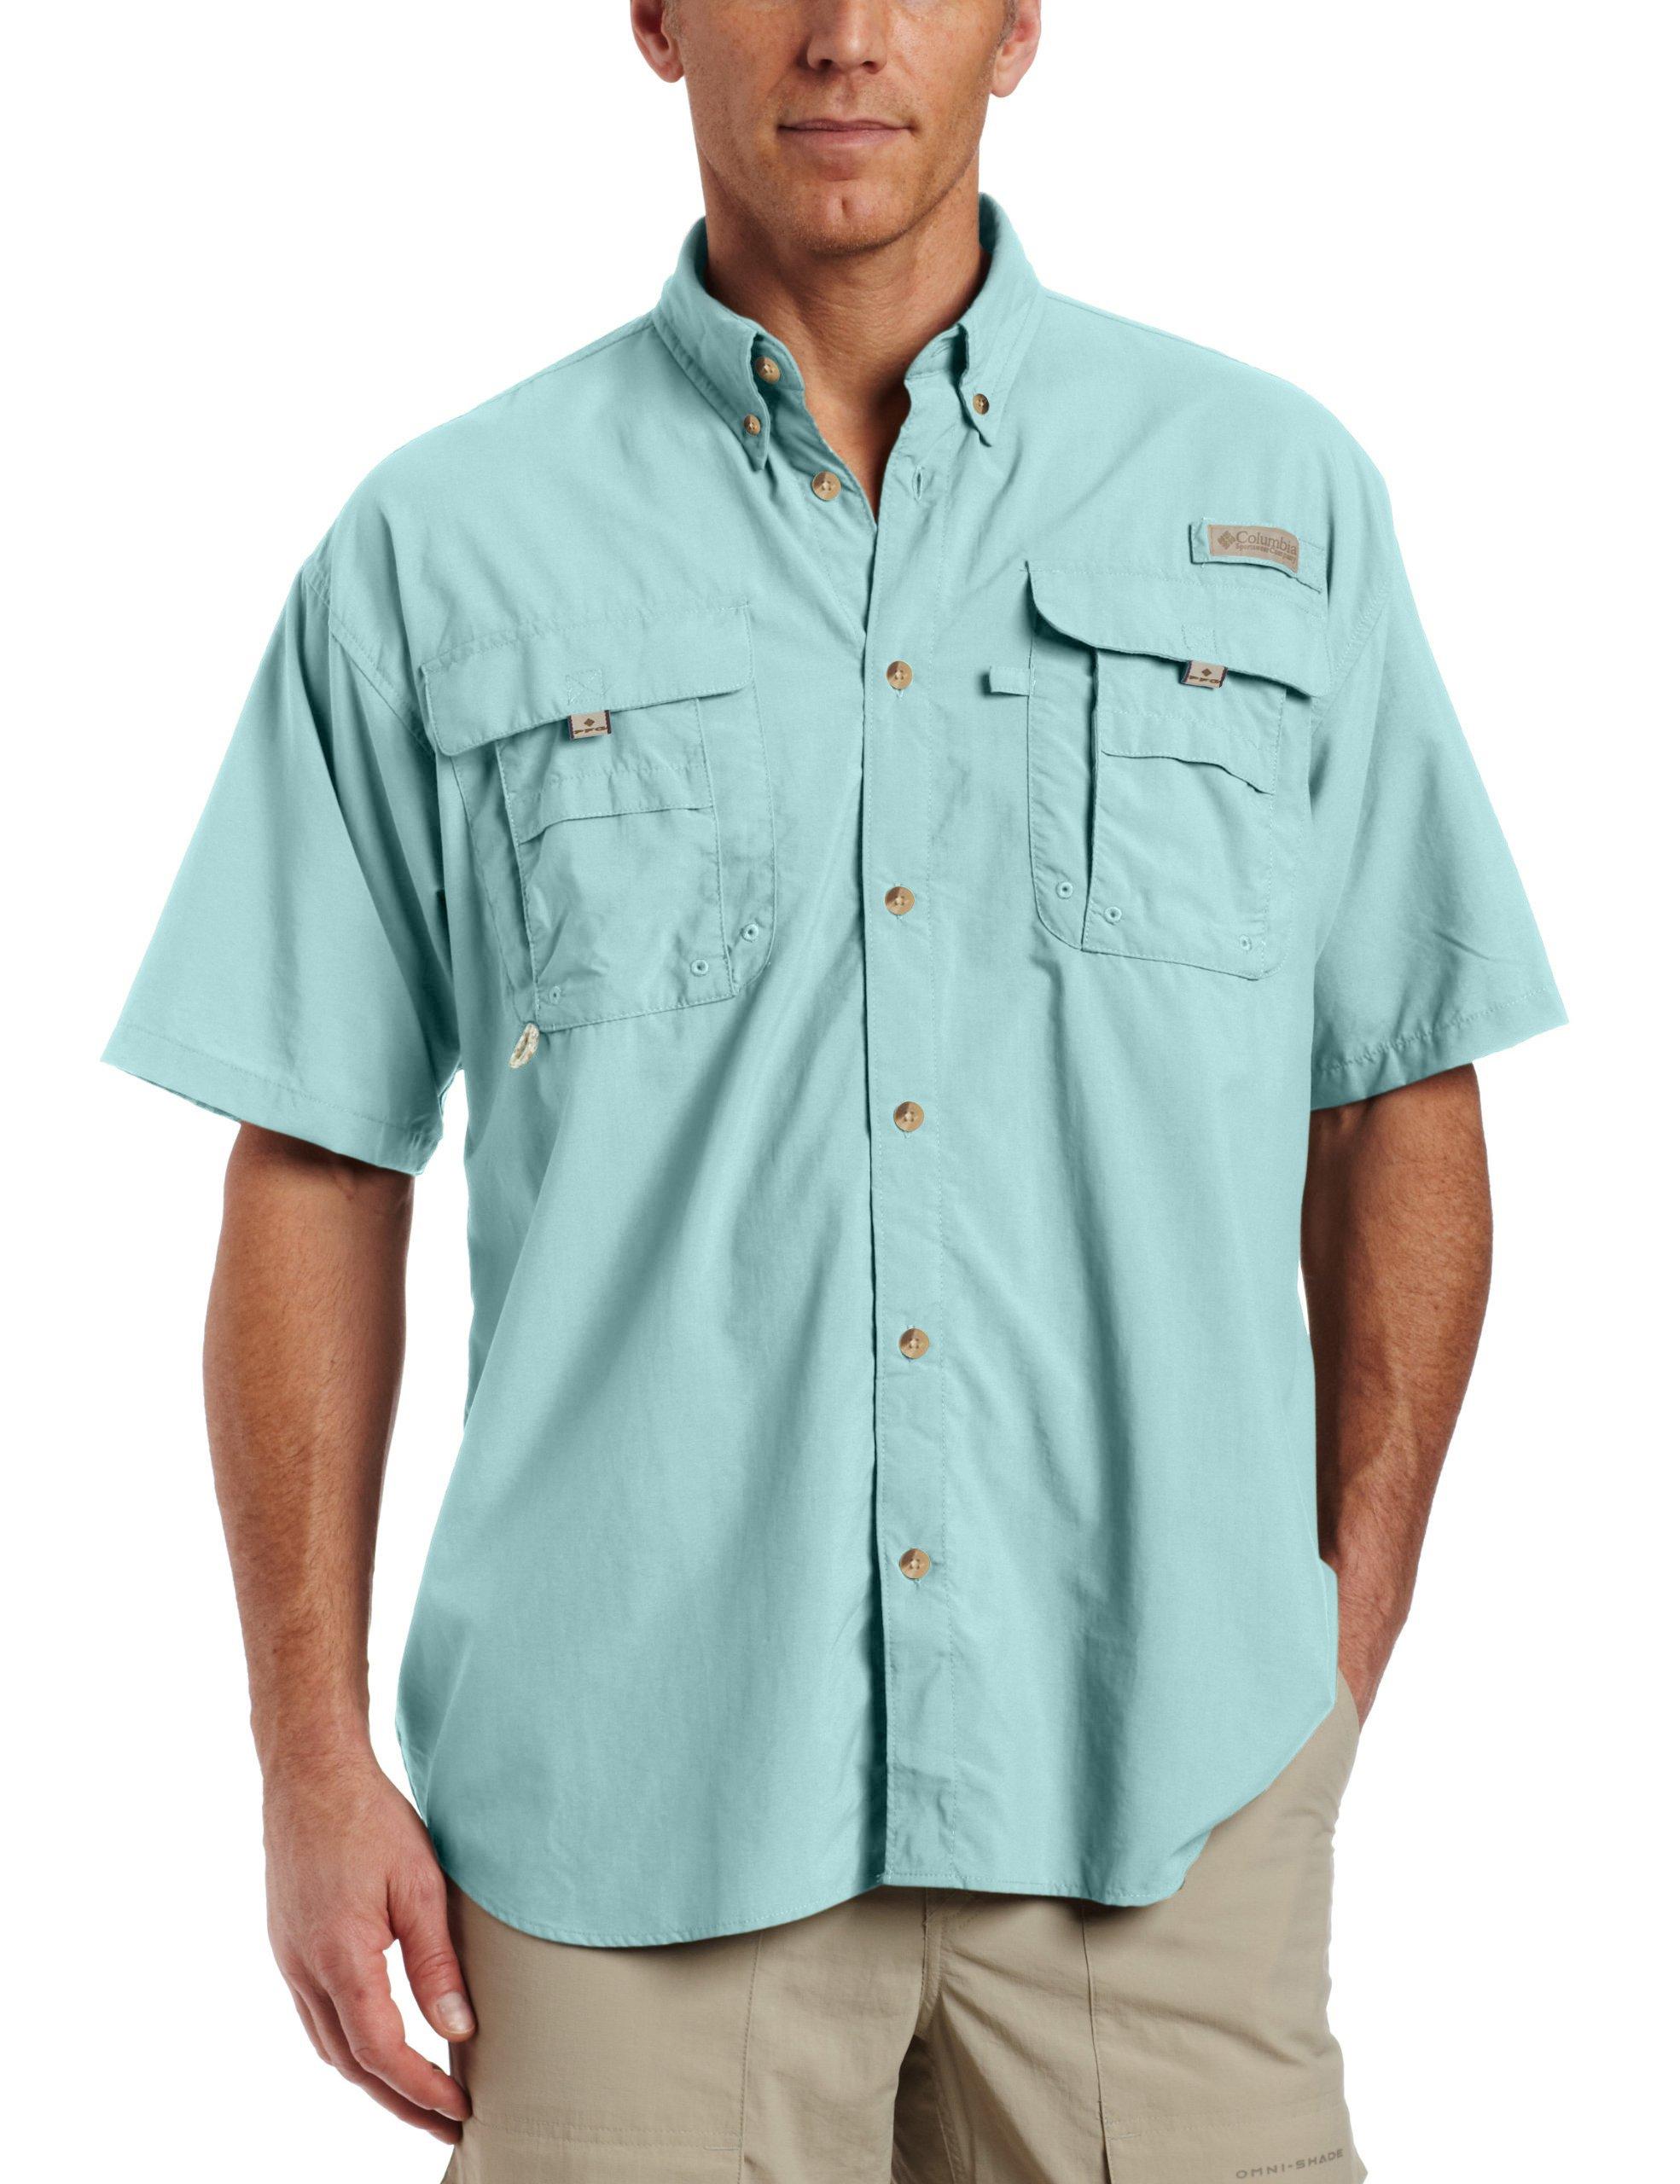 Columbia Men's Bahama II Extended Size Short Sleeve Shirt, Gulf Stream, XXXXX-Large